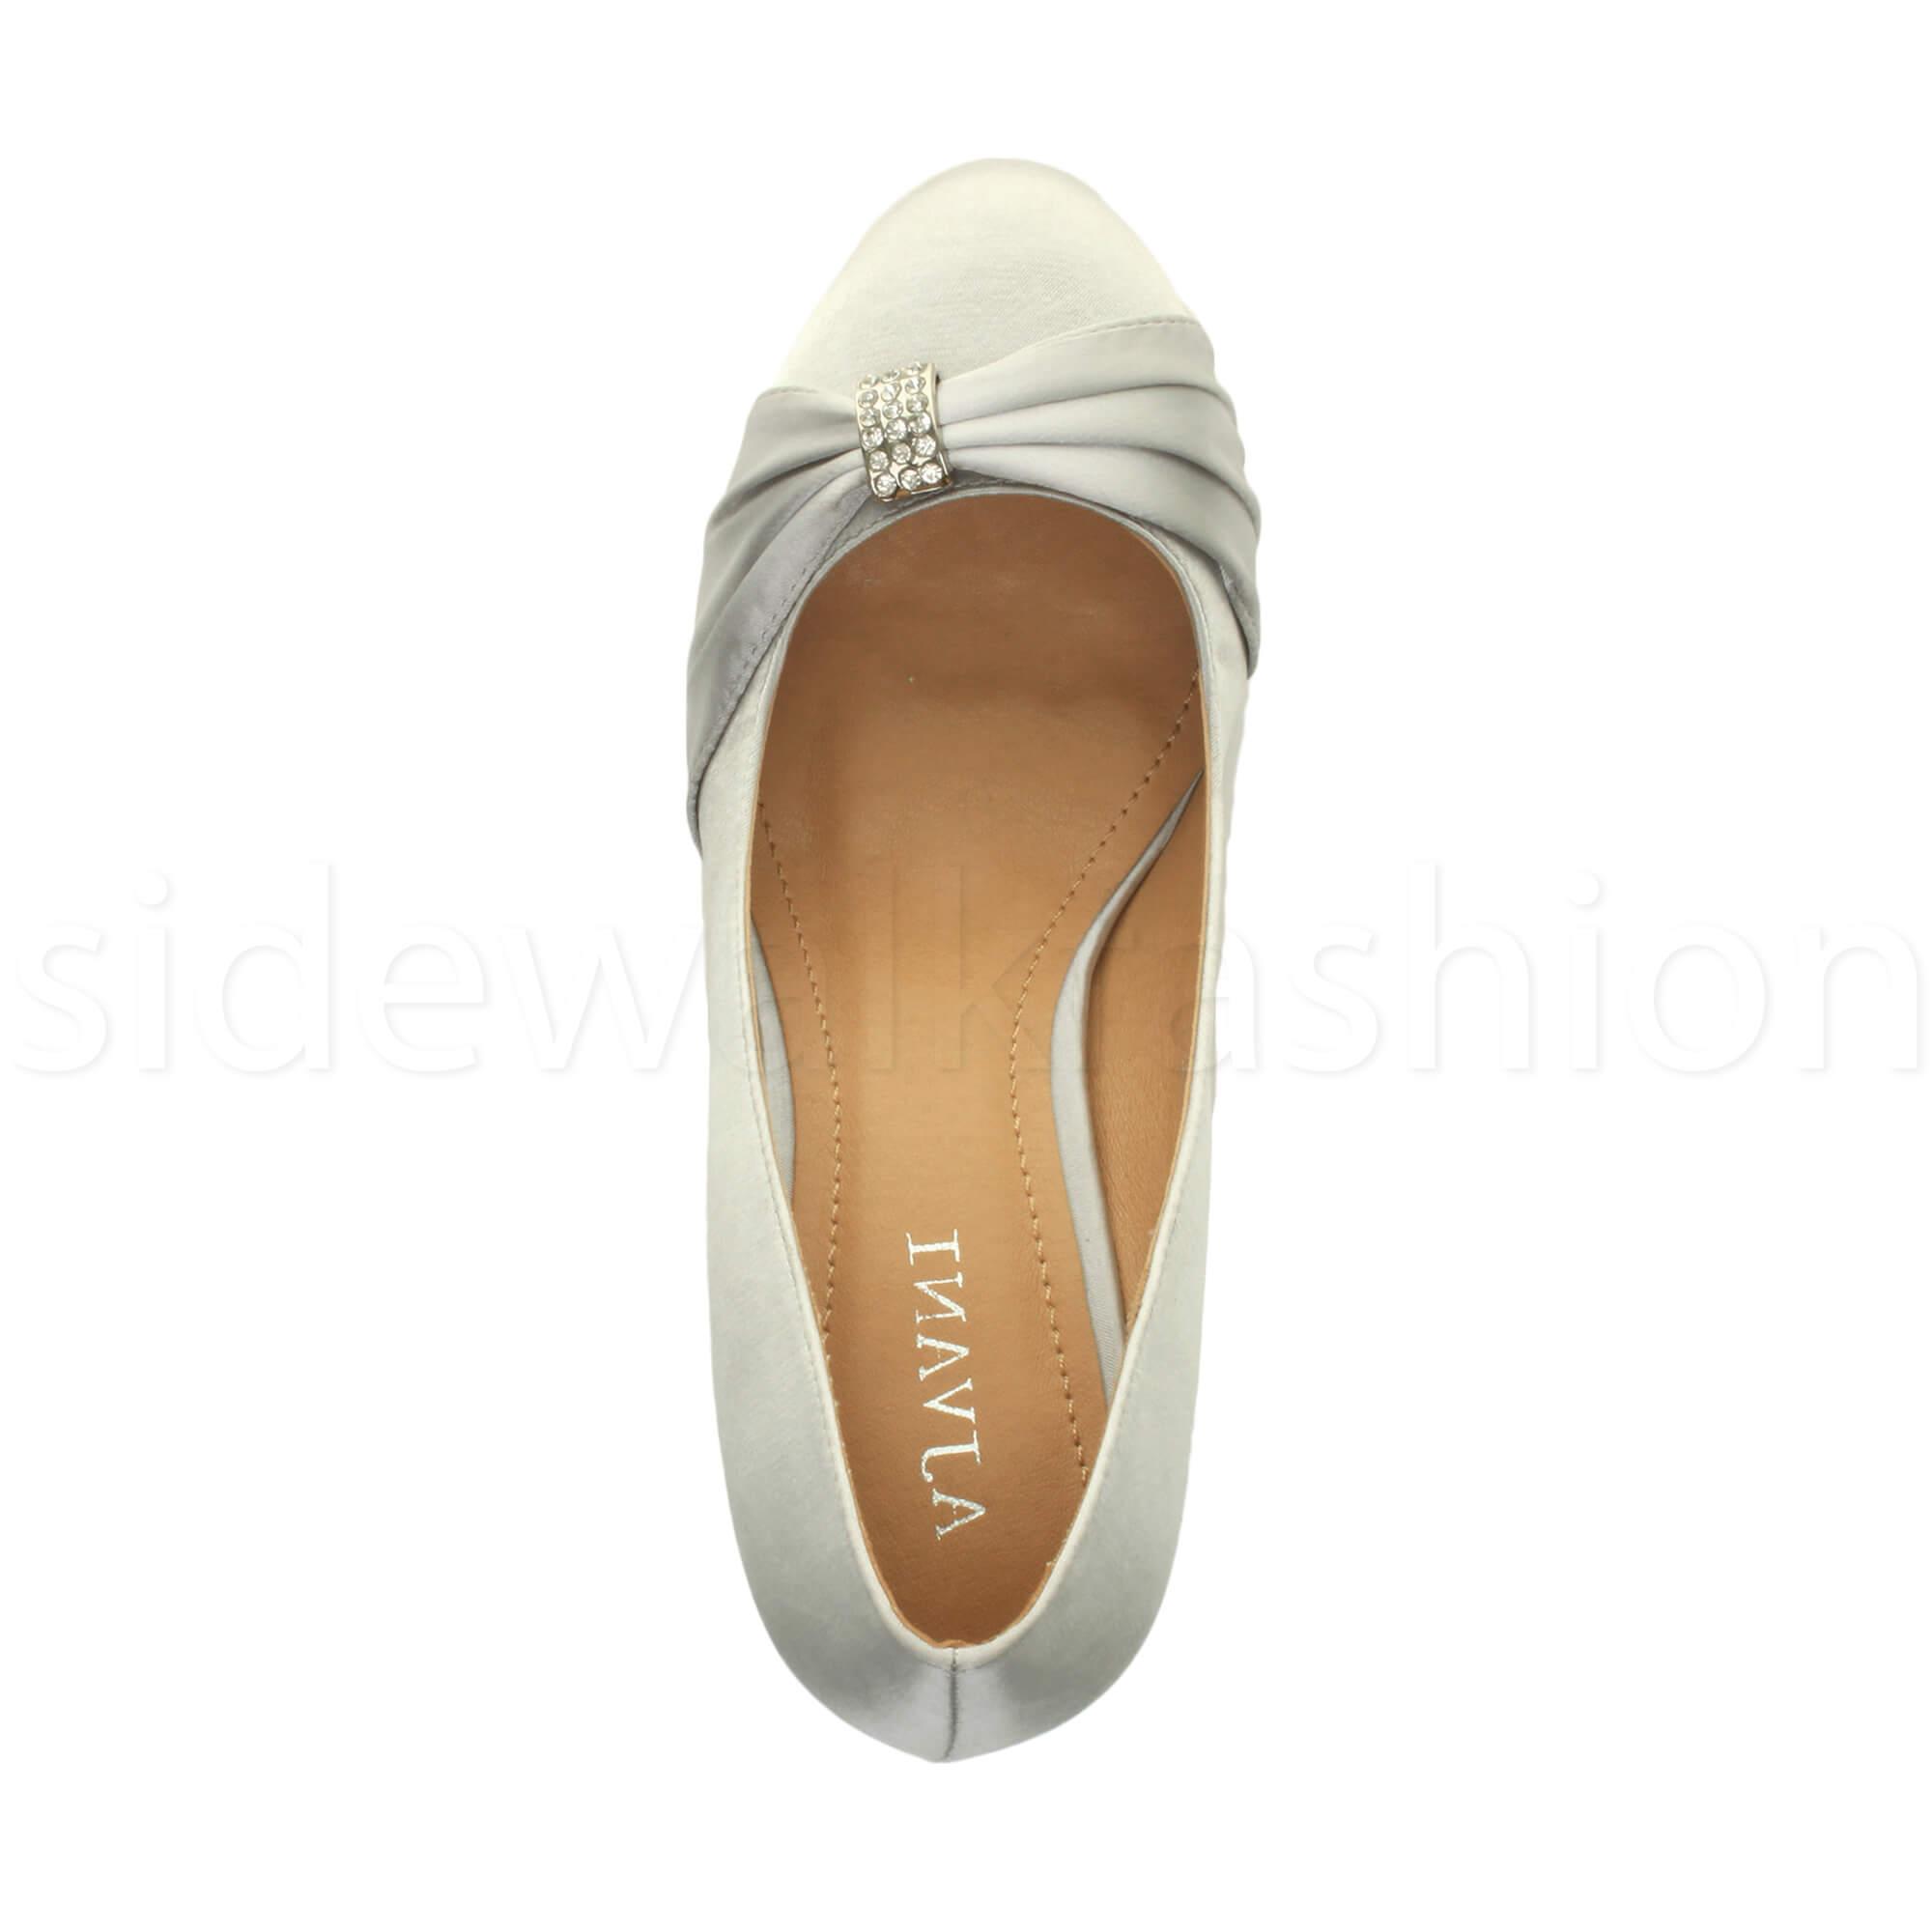 Womens-ladies-low-mid-heel-diamante-party-smart-evening-court-shoes-size thumbnail 96